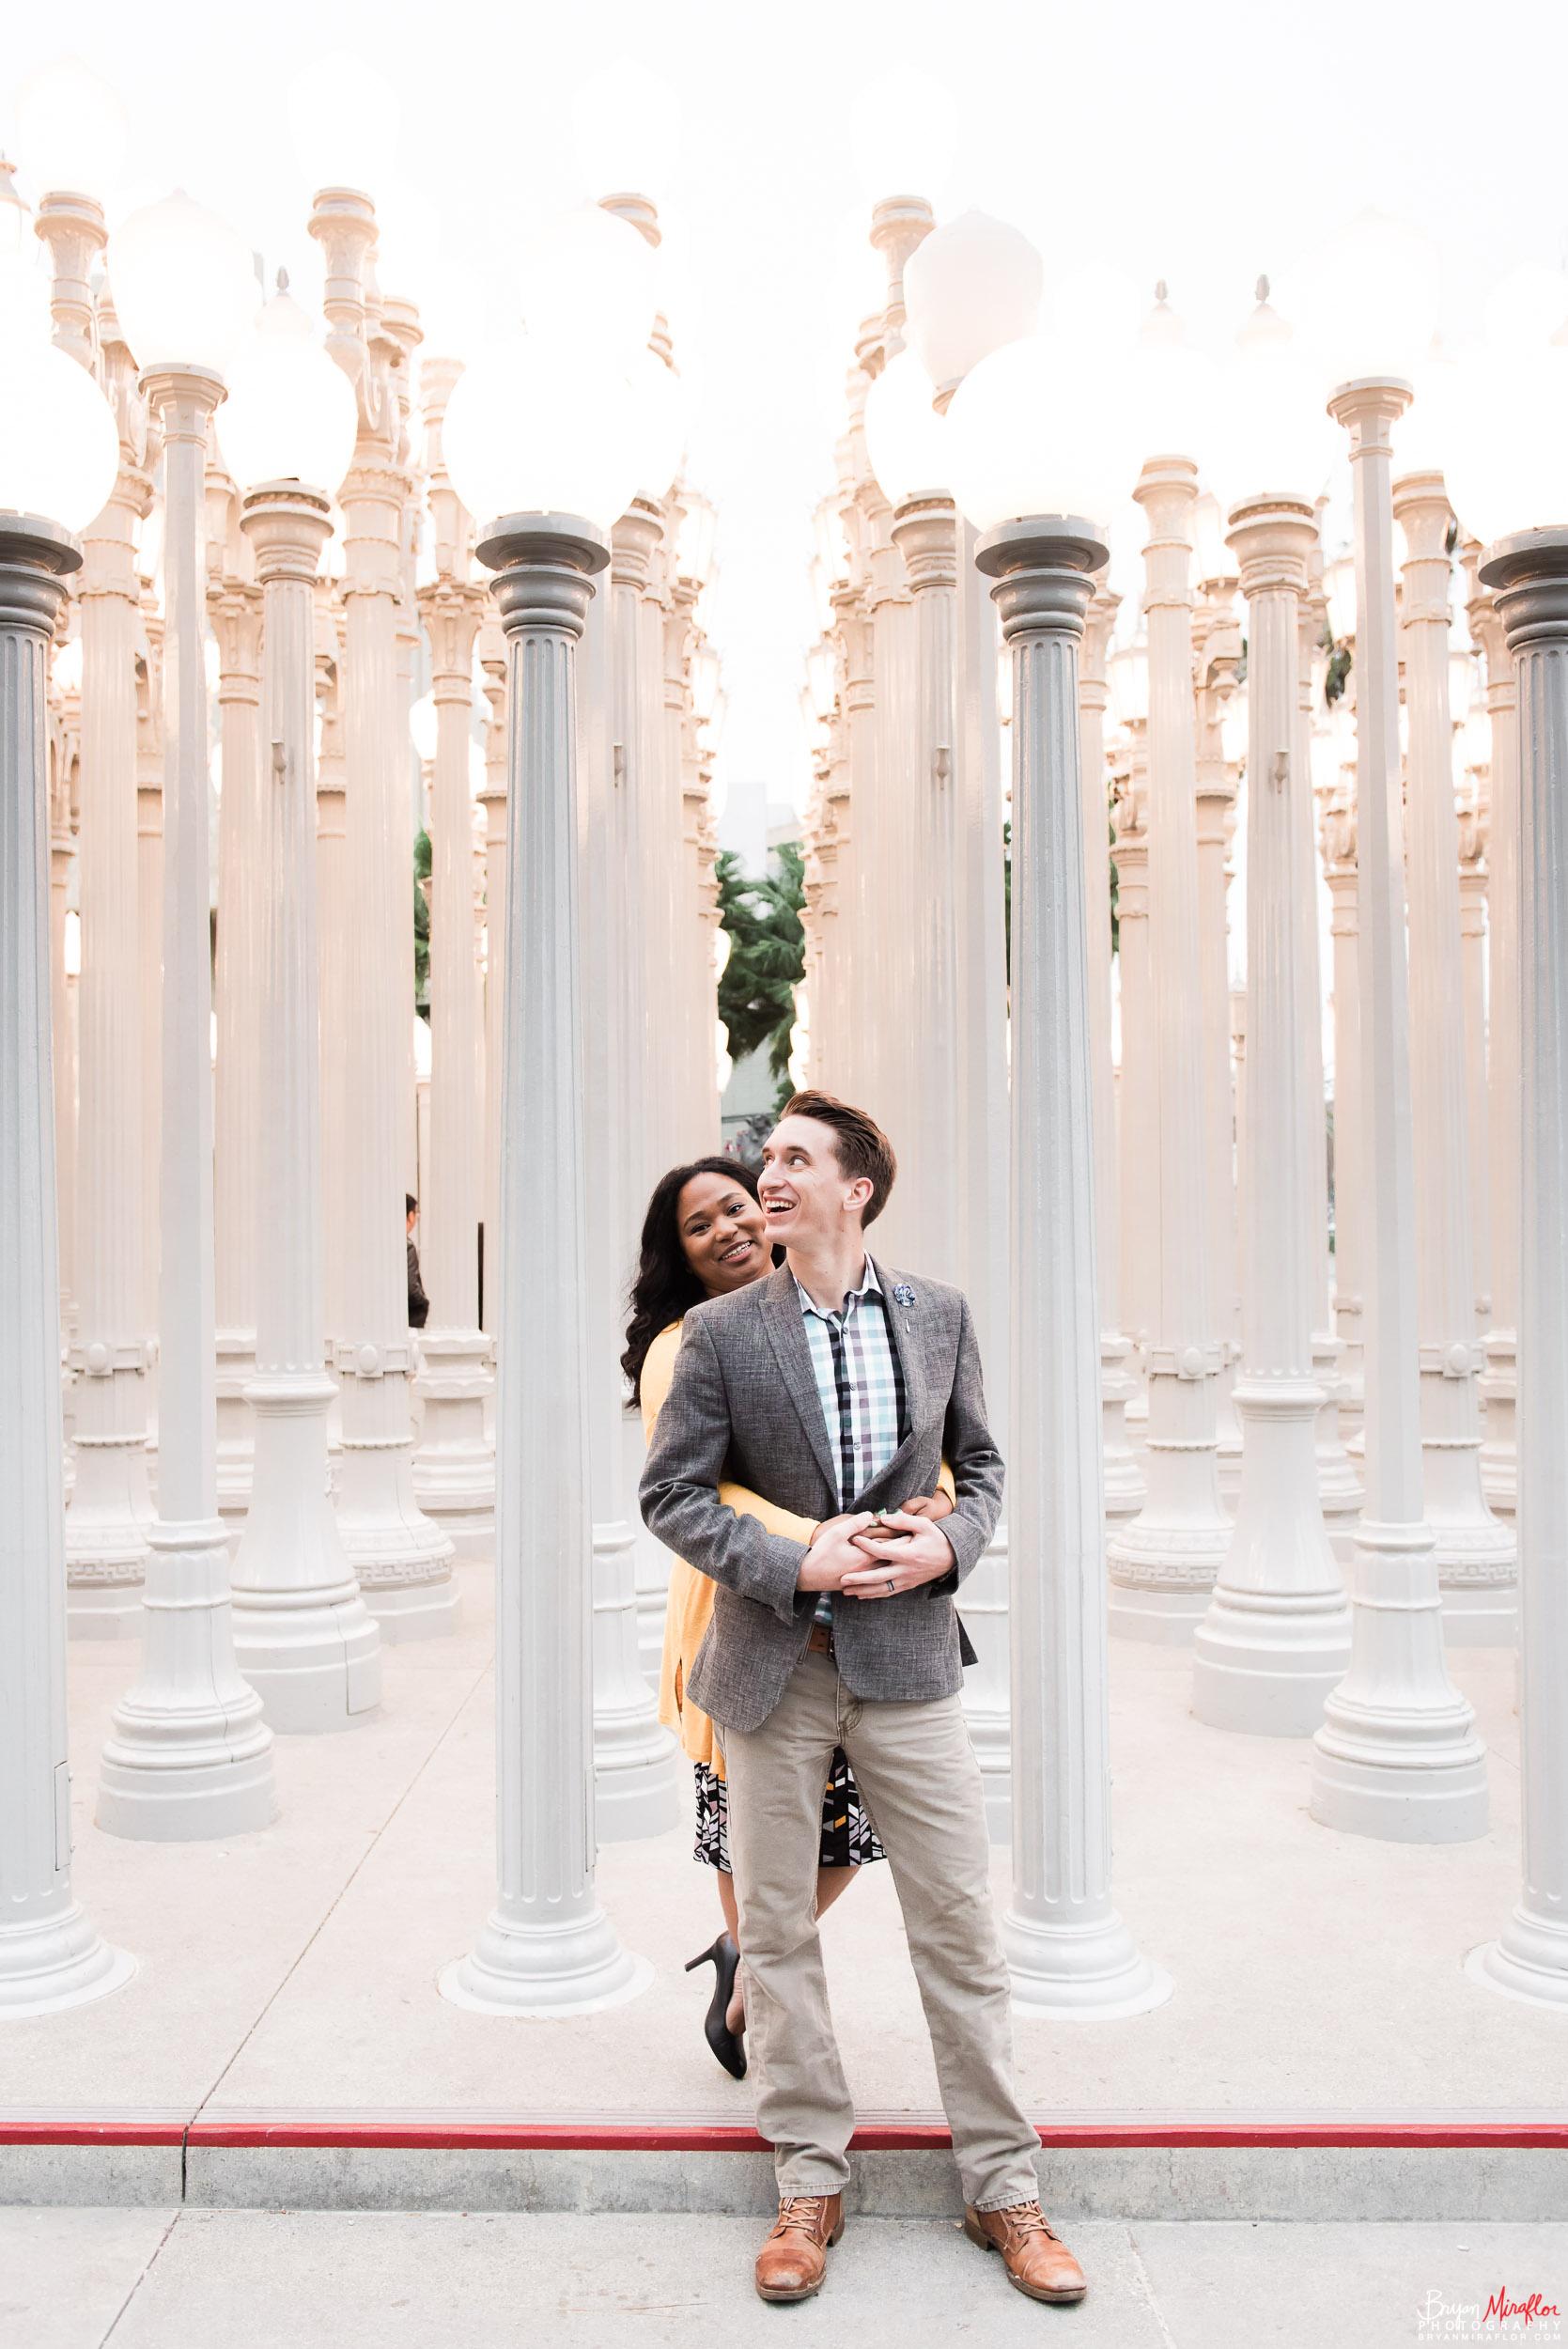 Bryan-Miraflor-Photography-Vanessa-Tommy-LACMA-DTLA-Engagement-Photoshoot-20161210-192.jpg